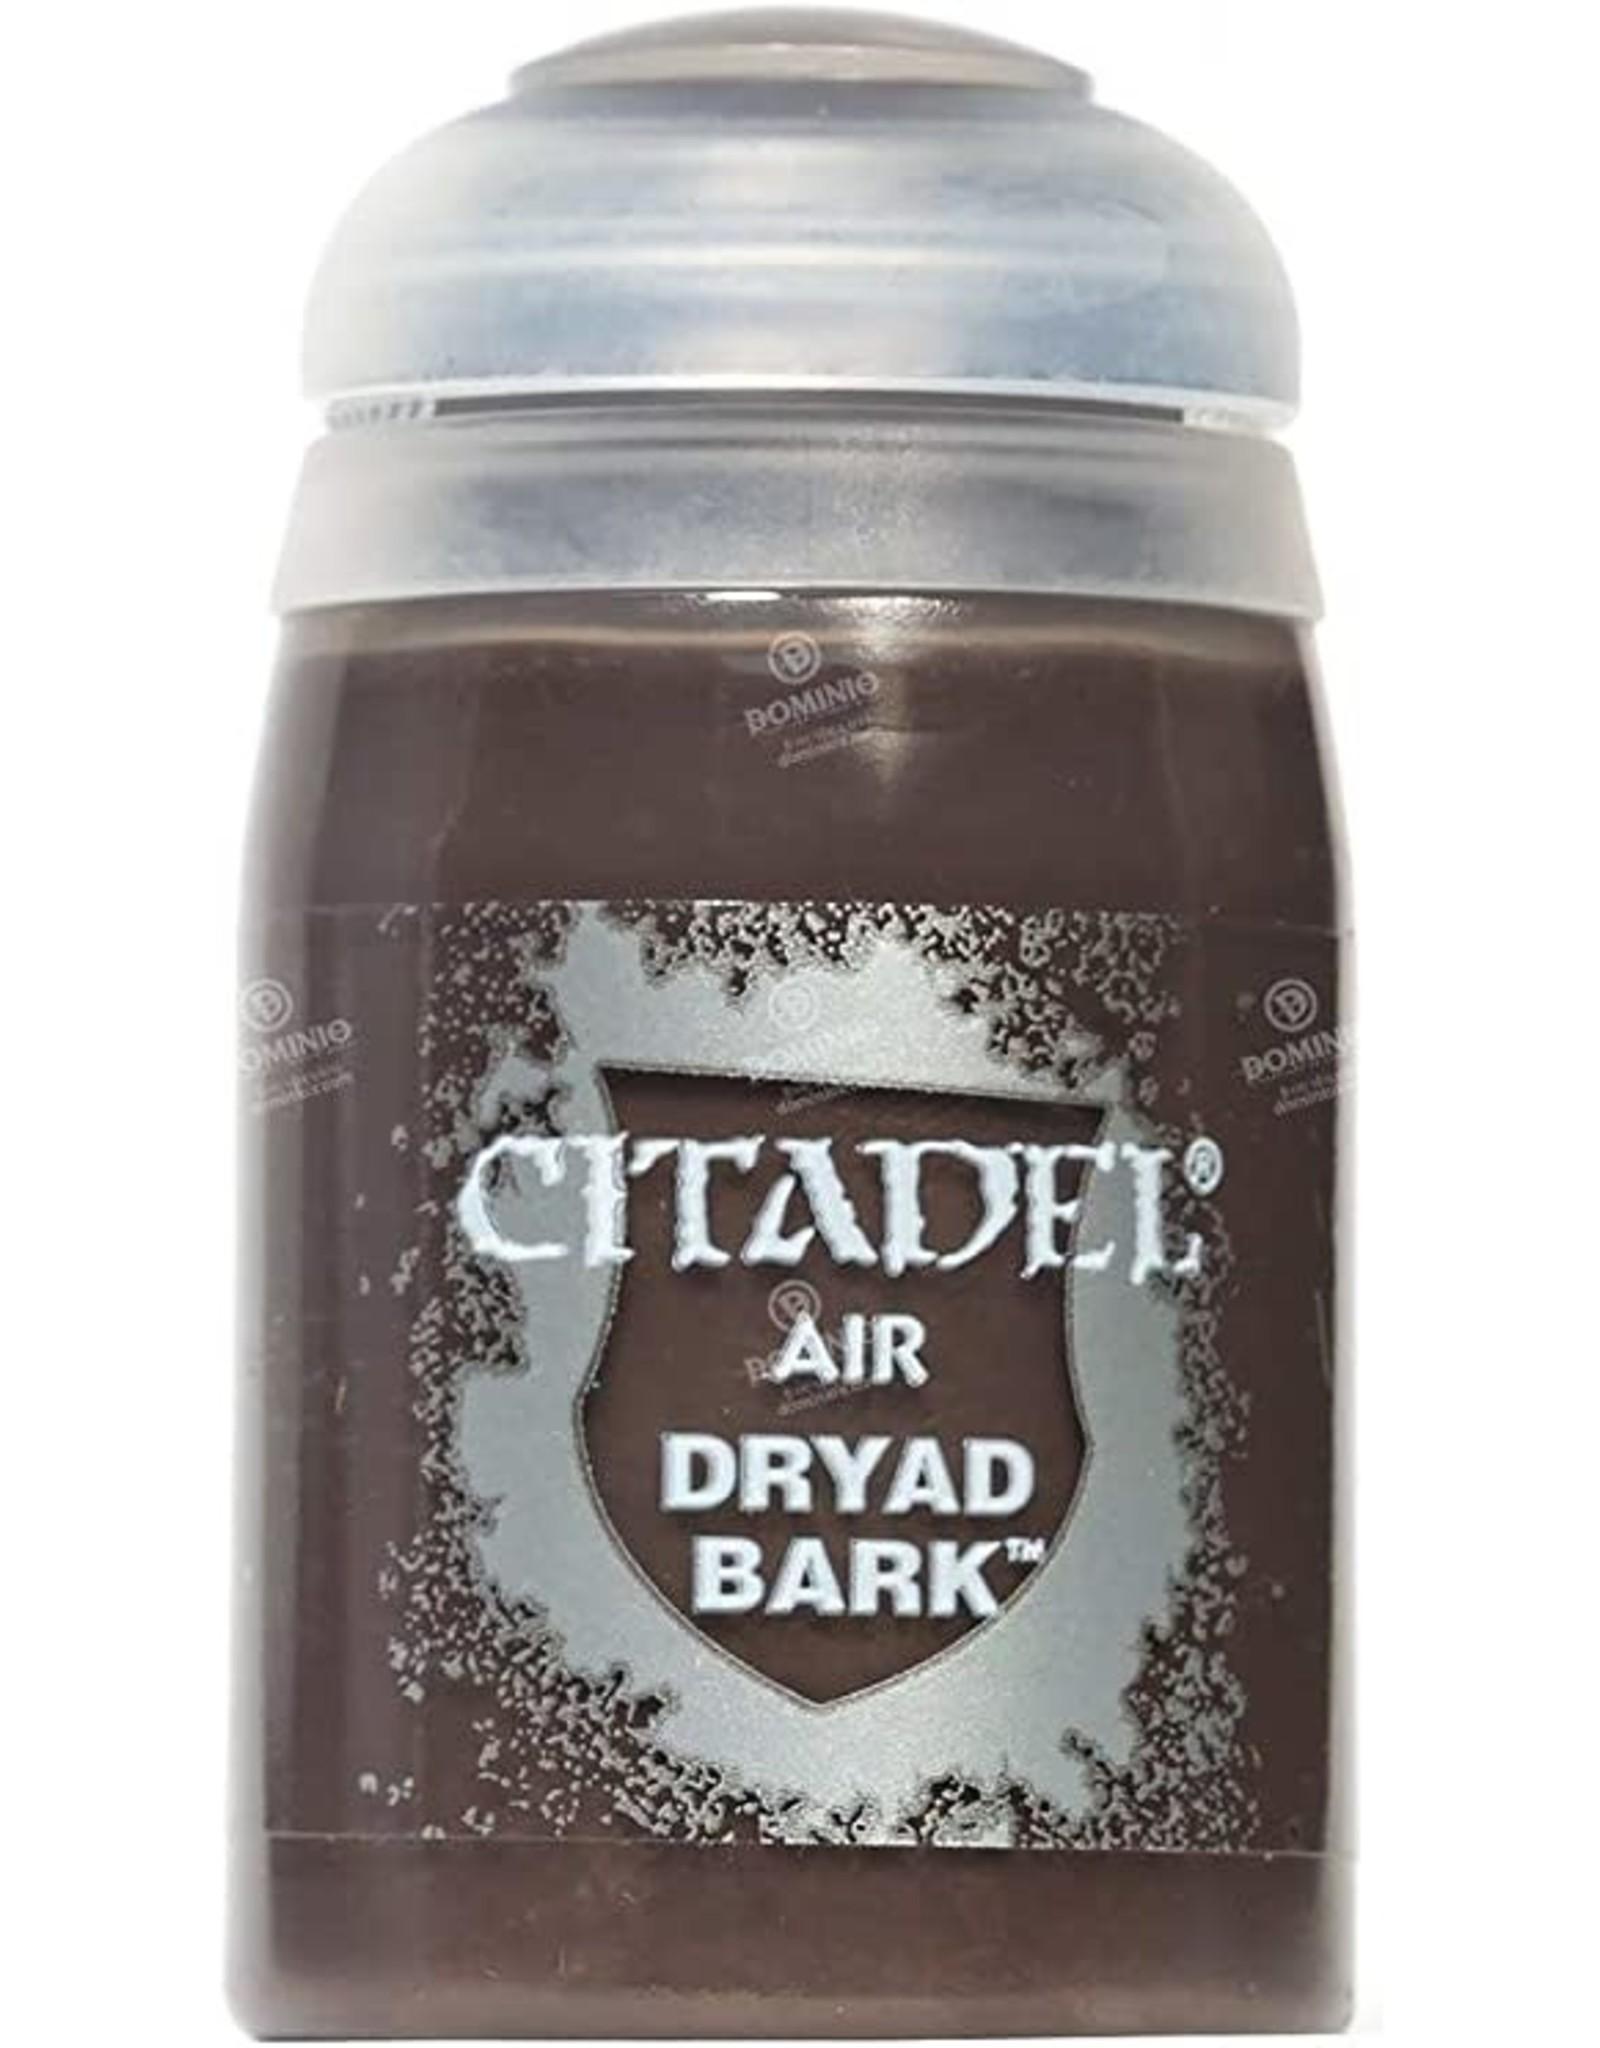 Games Workshop Citadel Paint: Dryad Bark Air (24 ml)